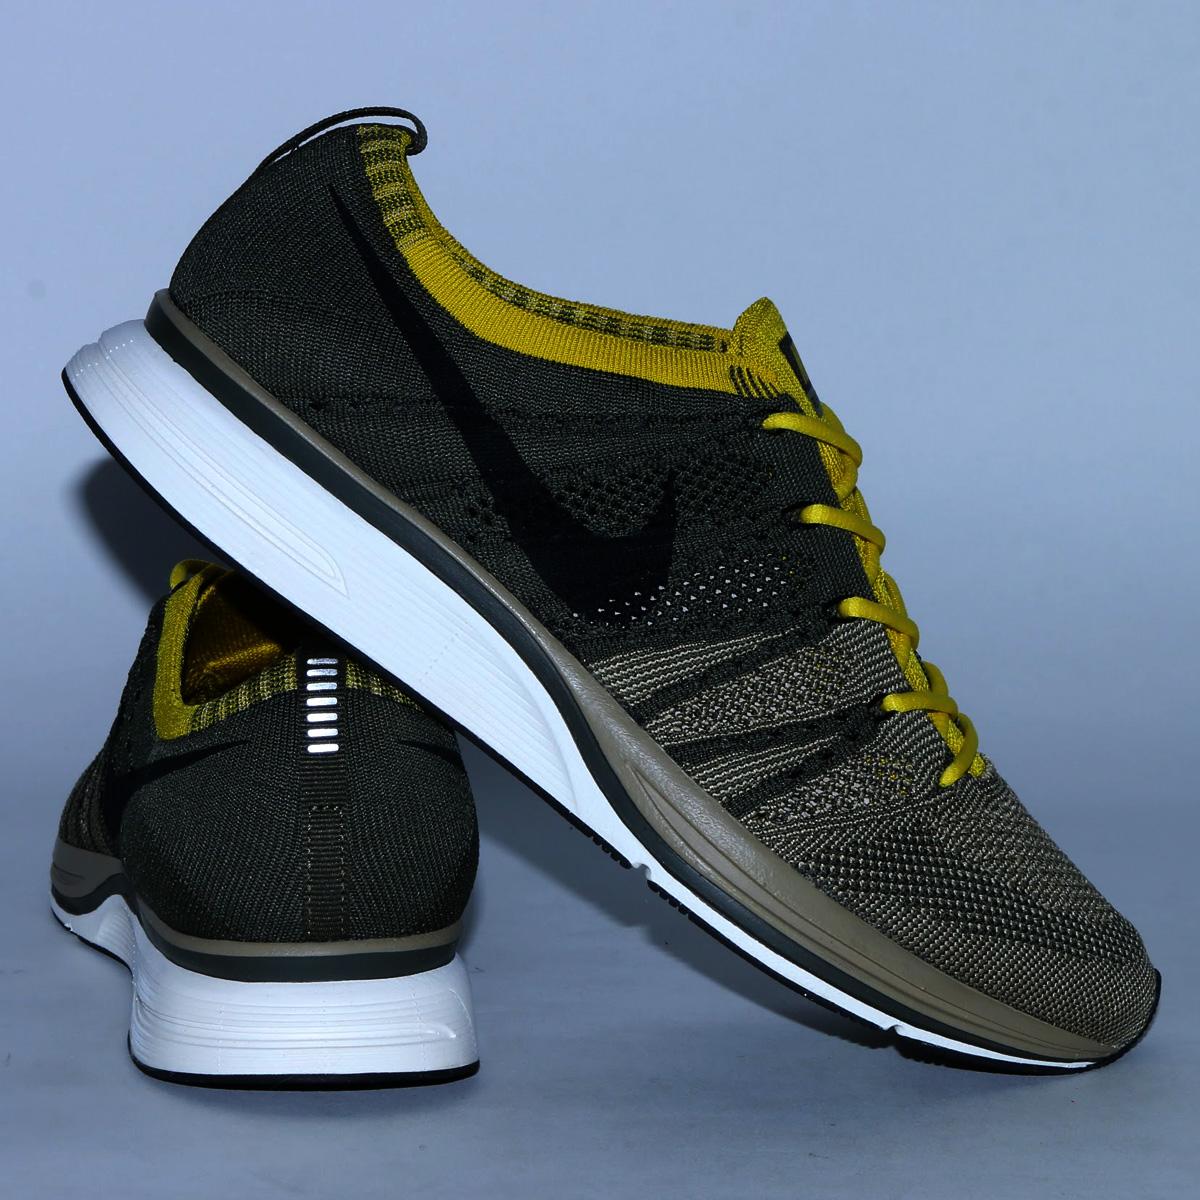 79d6909be16e NIKE FLYKNIT TRAINER (Nike fried food knit trainer) (CARGO  KHAKI BLACK-SAIL-BRIGHT CITRON) 18SP-S